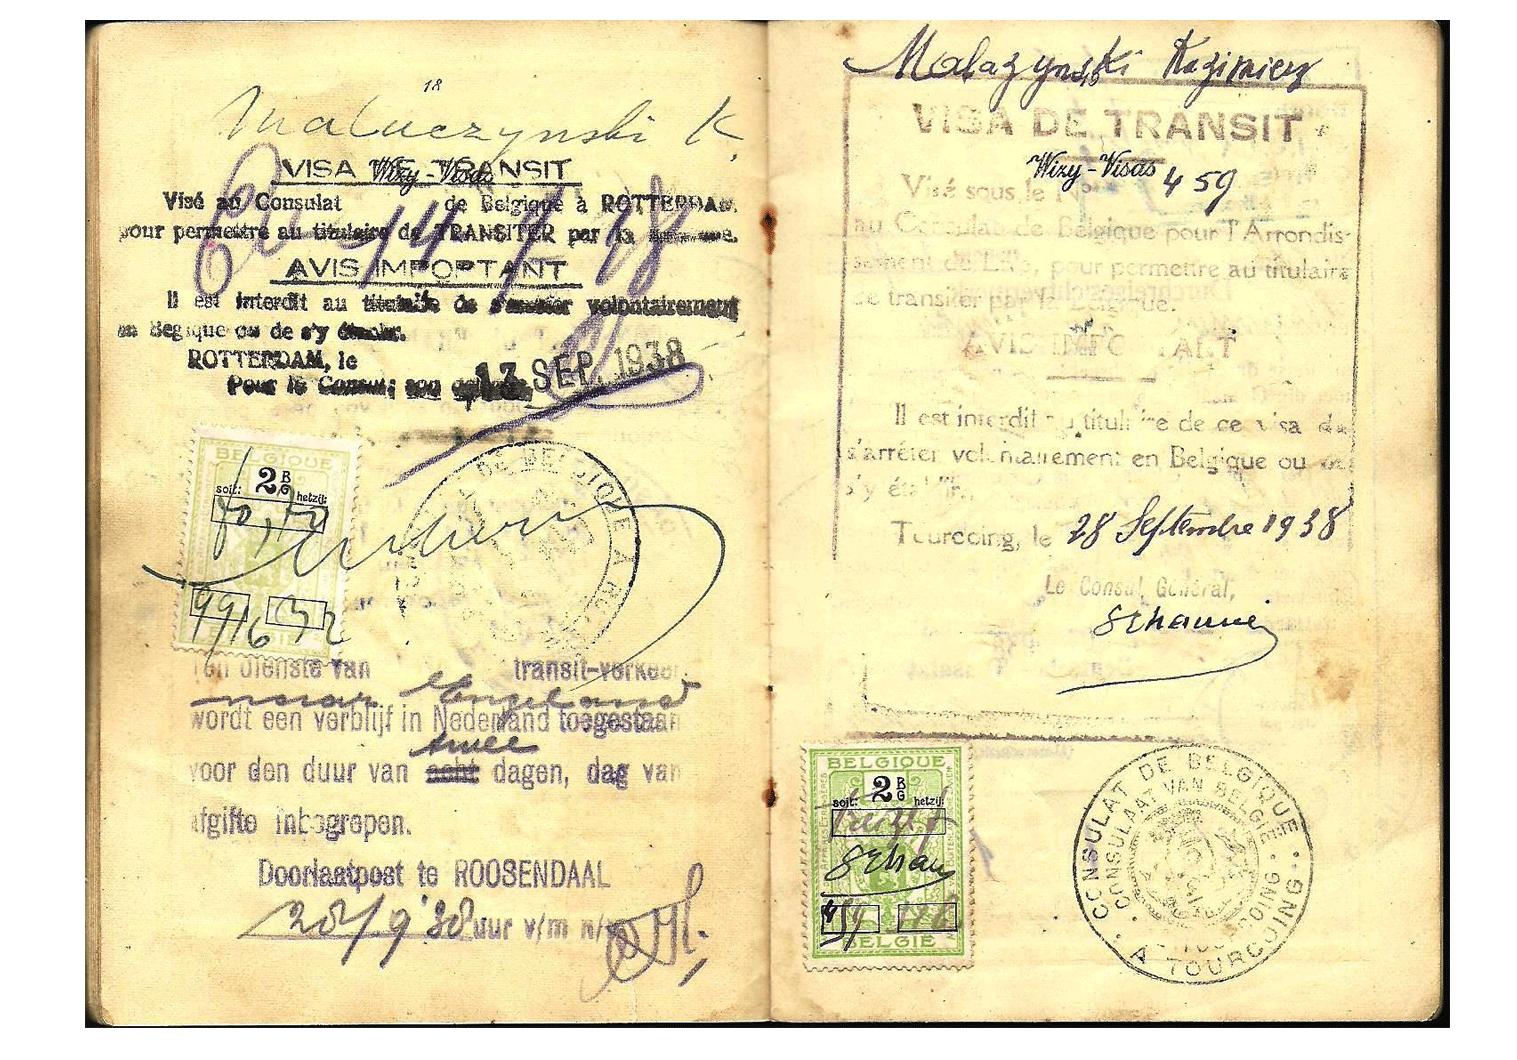 WW2 Belgium visa